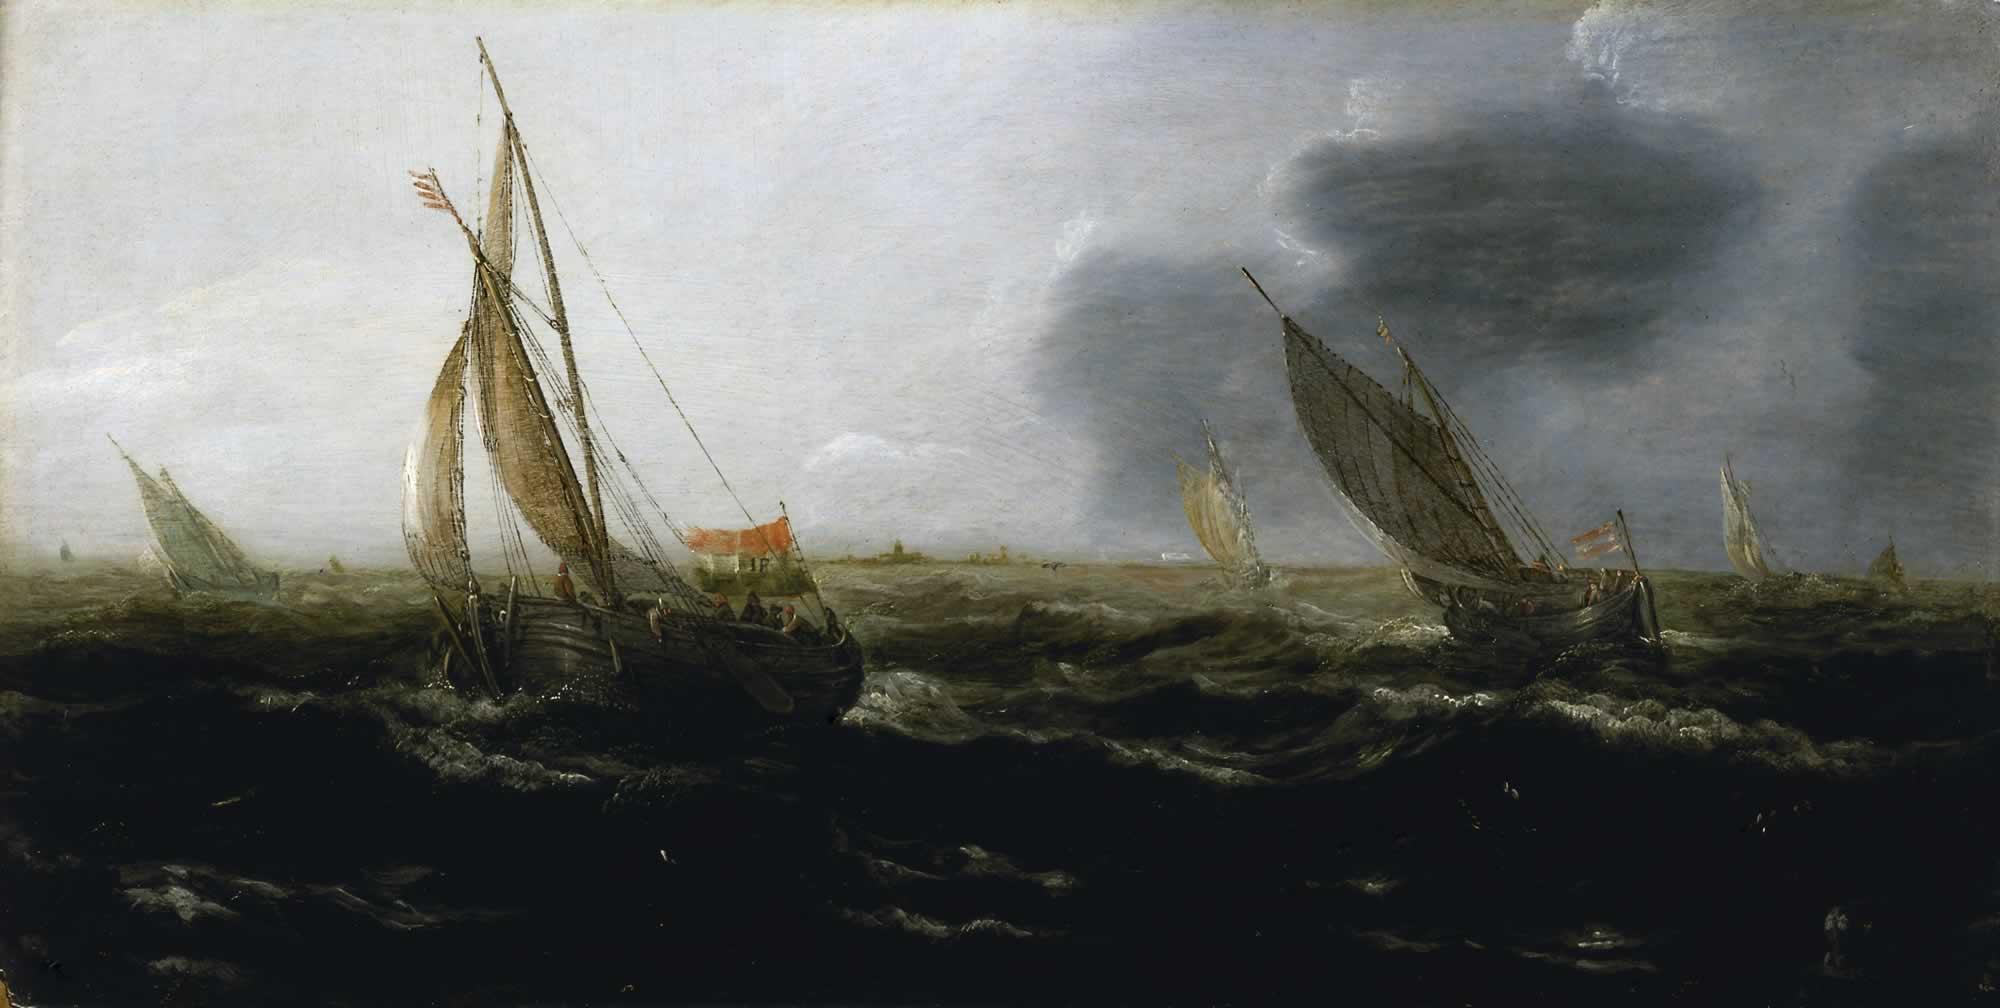 Jan_Porcellis_-_Dutch_Vessels_in_a_Stron